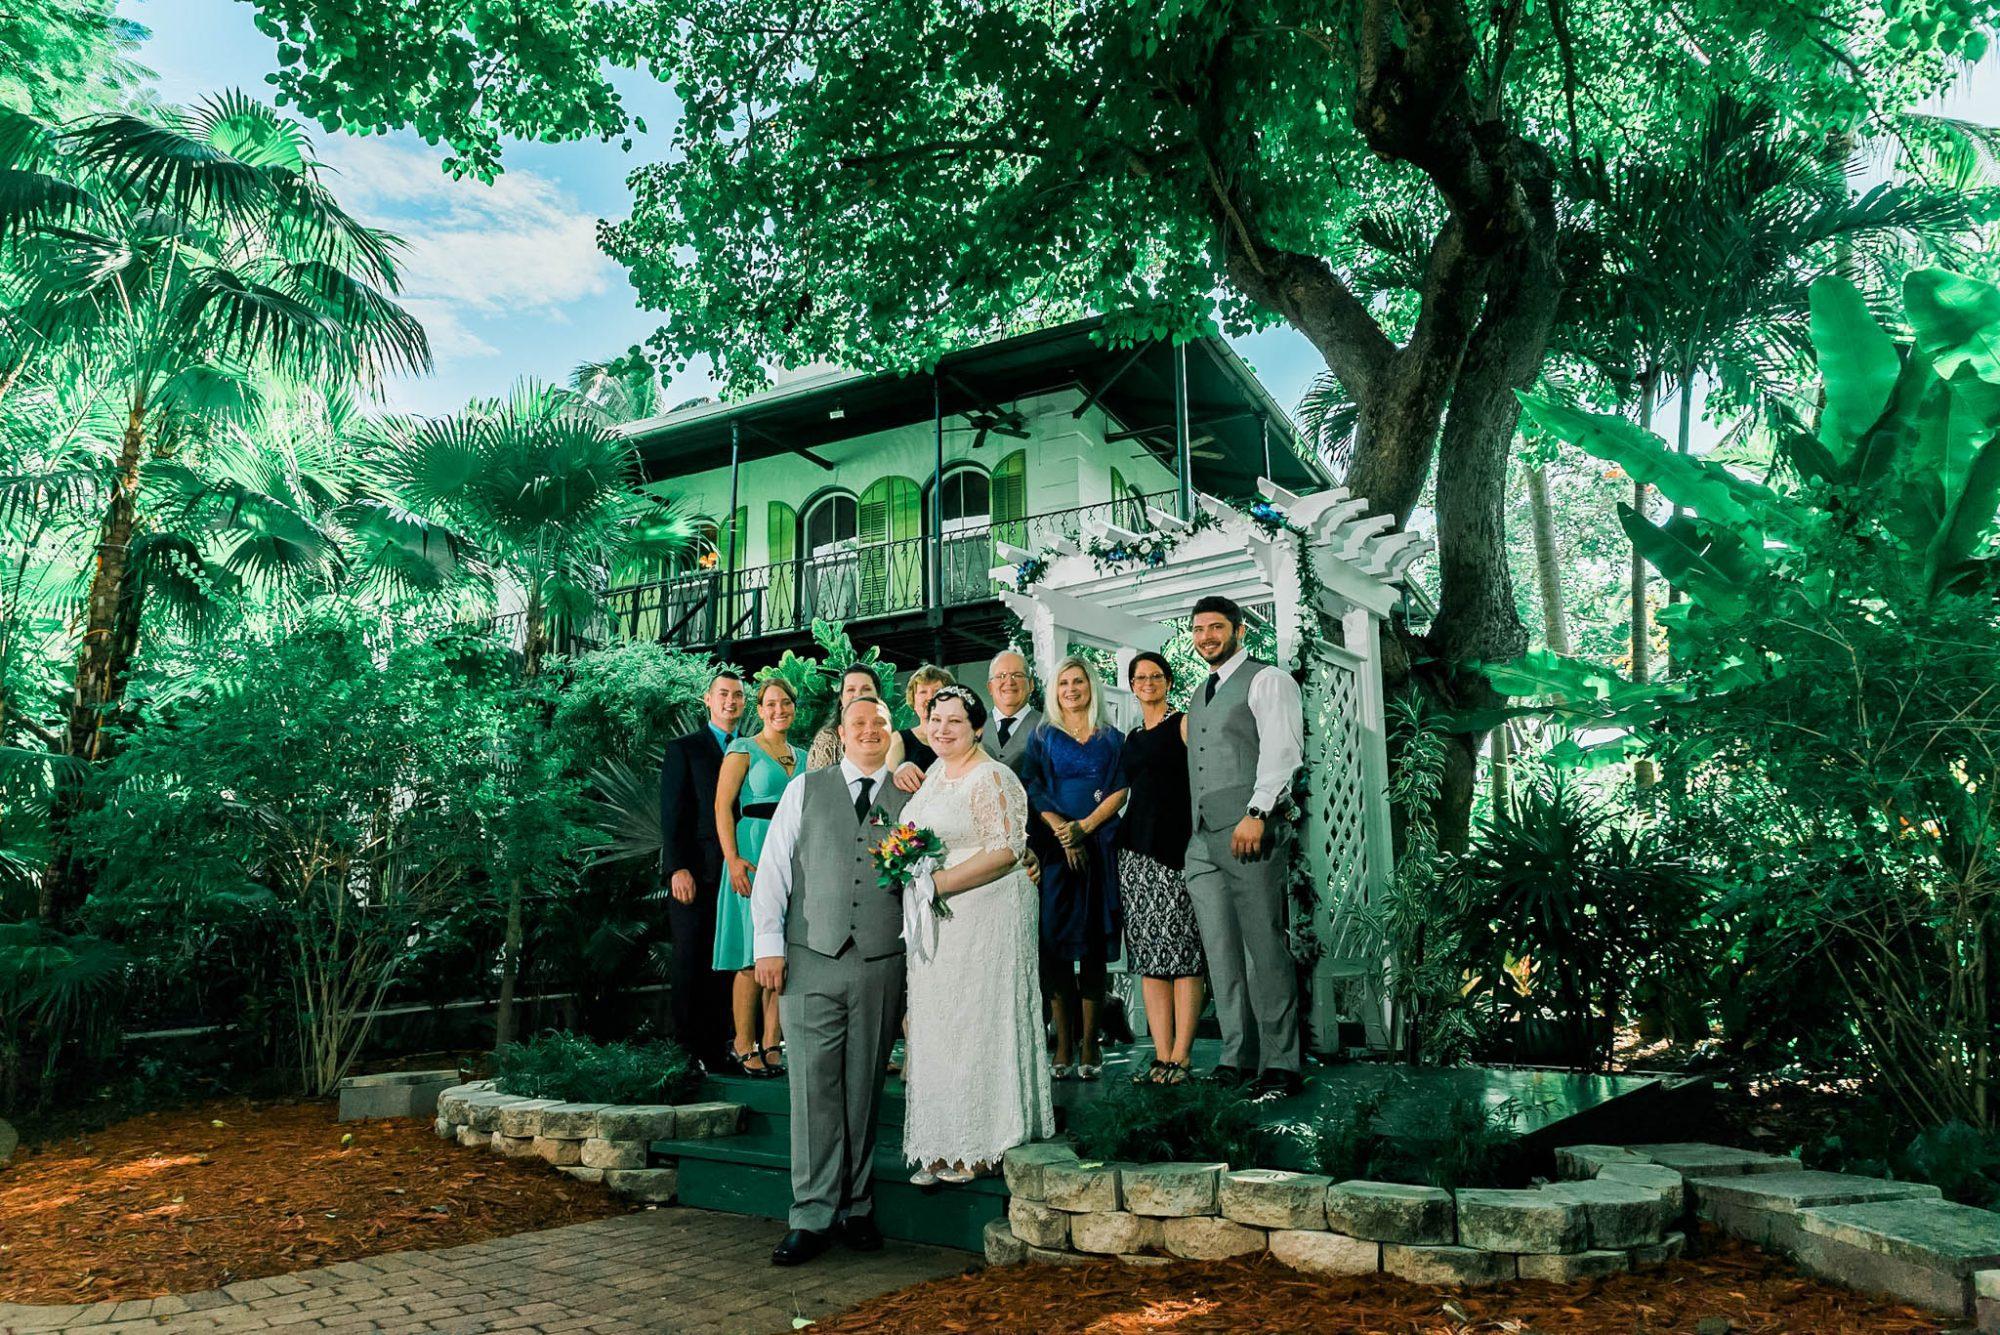 Becca and Leigh Hemingway Home Key West 277 - Becca & Leigh - Key West Wedding Photographer - Ernest Hemingway House